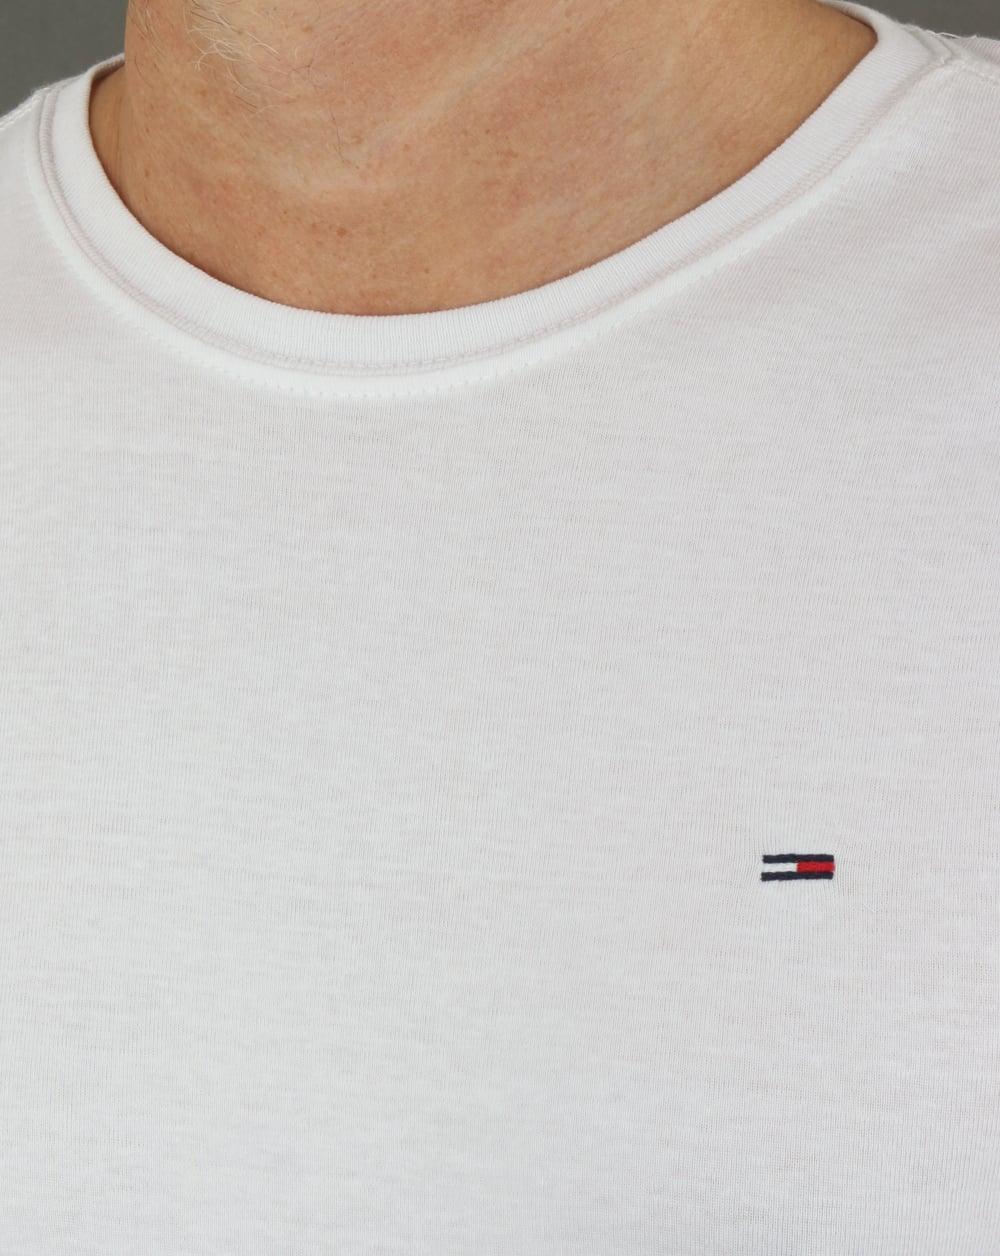 9ac351ef Tommy Hilfiger Rib Long Sleeve T Shirt White   80s casual classics